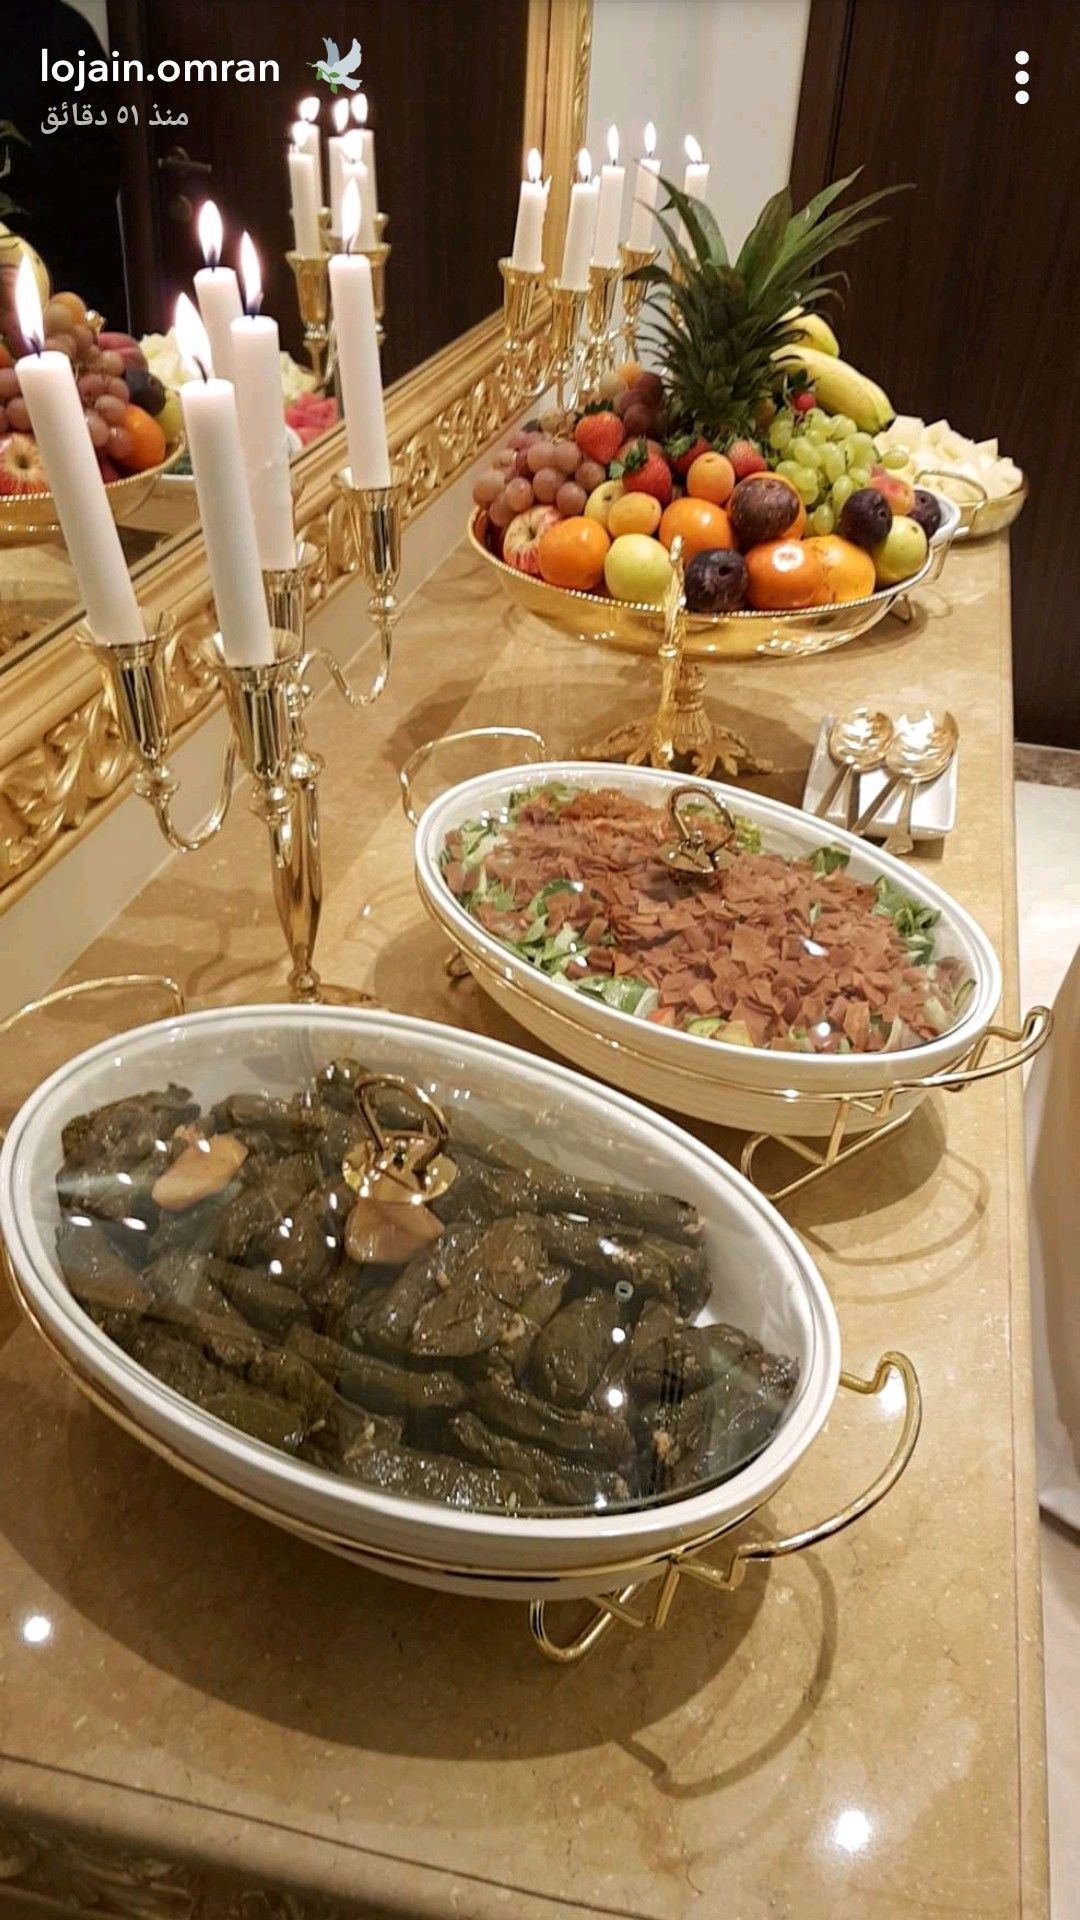 Pin By Thaynara Campedelli On طبخات وضيافة عربية وعالمية Buffet Food Food Displays Party Food Buffet